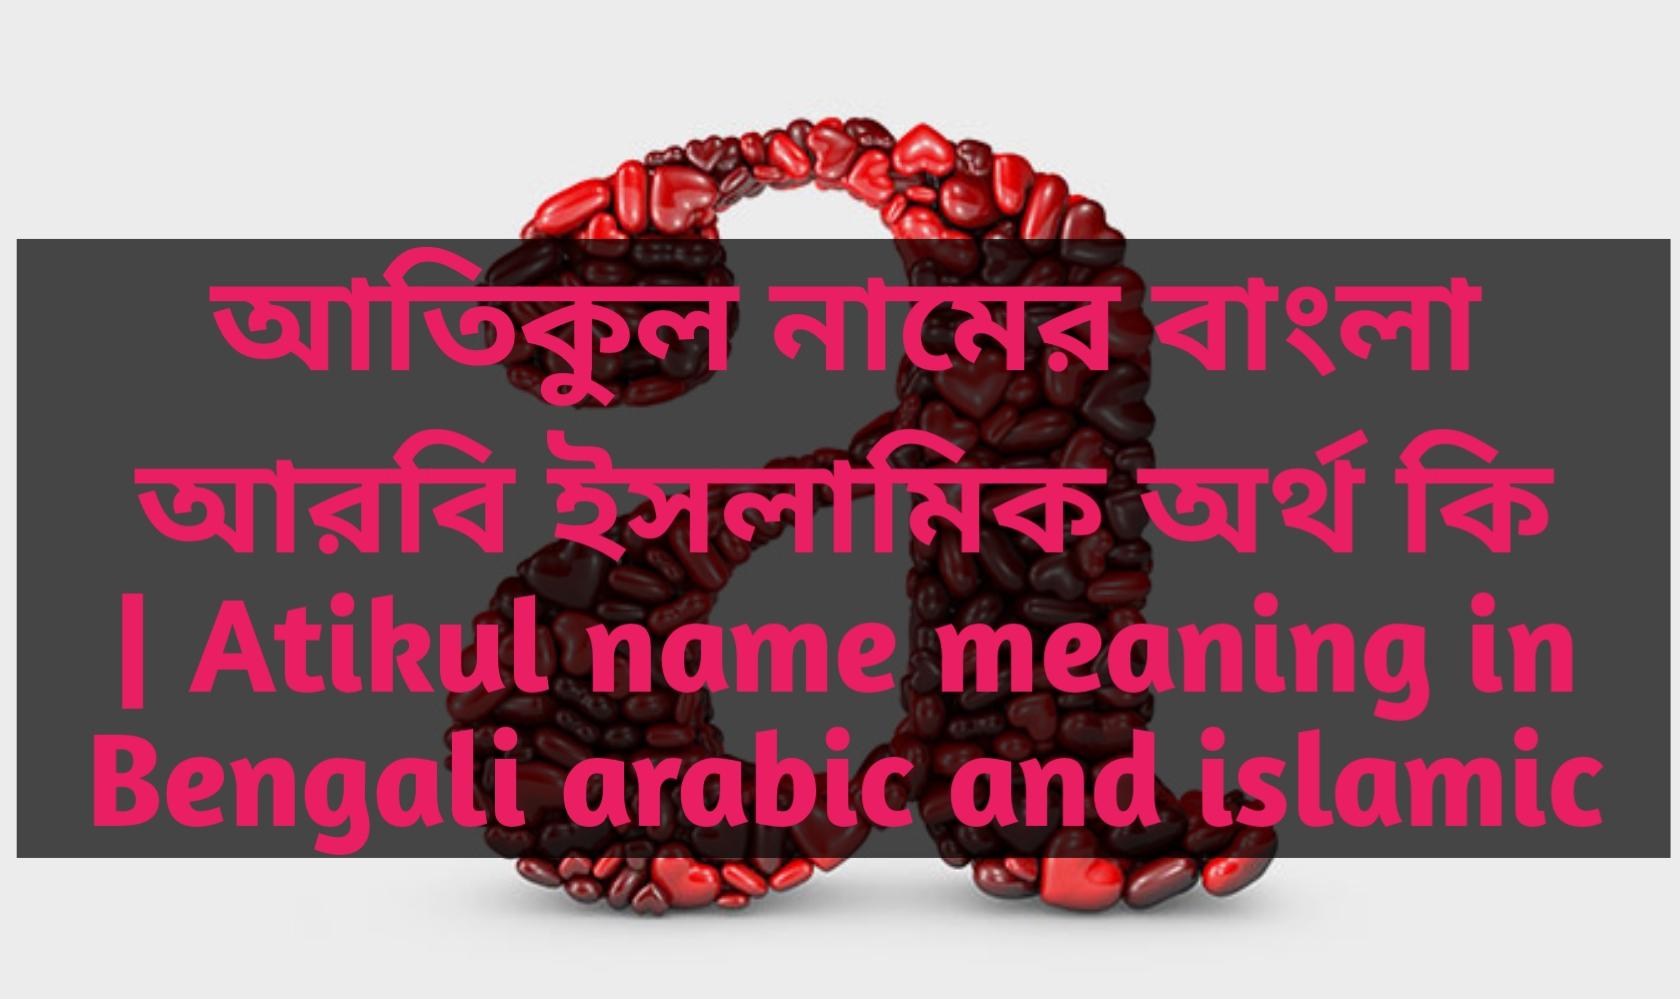 atikul name meaning in Bengali, আতিকুল নামের অর্থ কি, আতিকুল নামের বাংলা অর্থ কি, আতিকুল নামের ইসলামিক অর্থ কি,